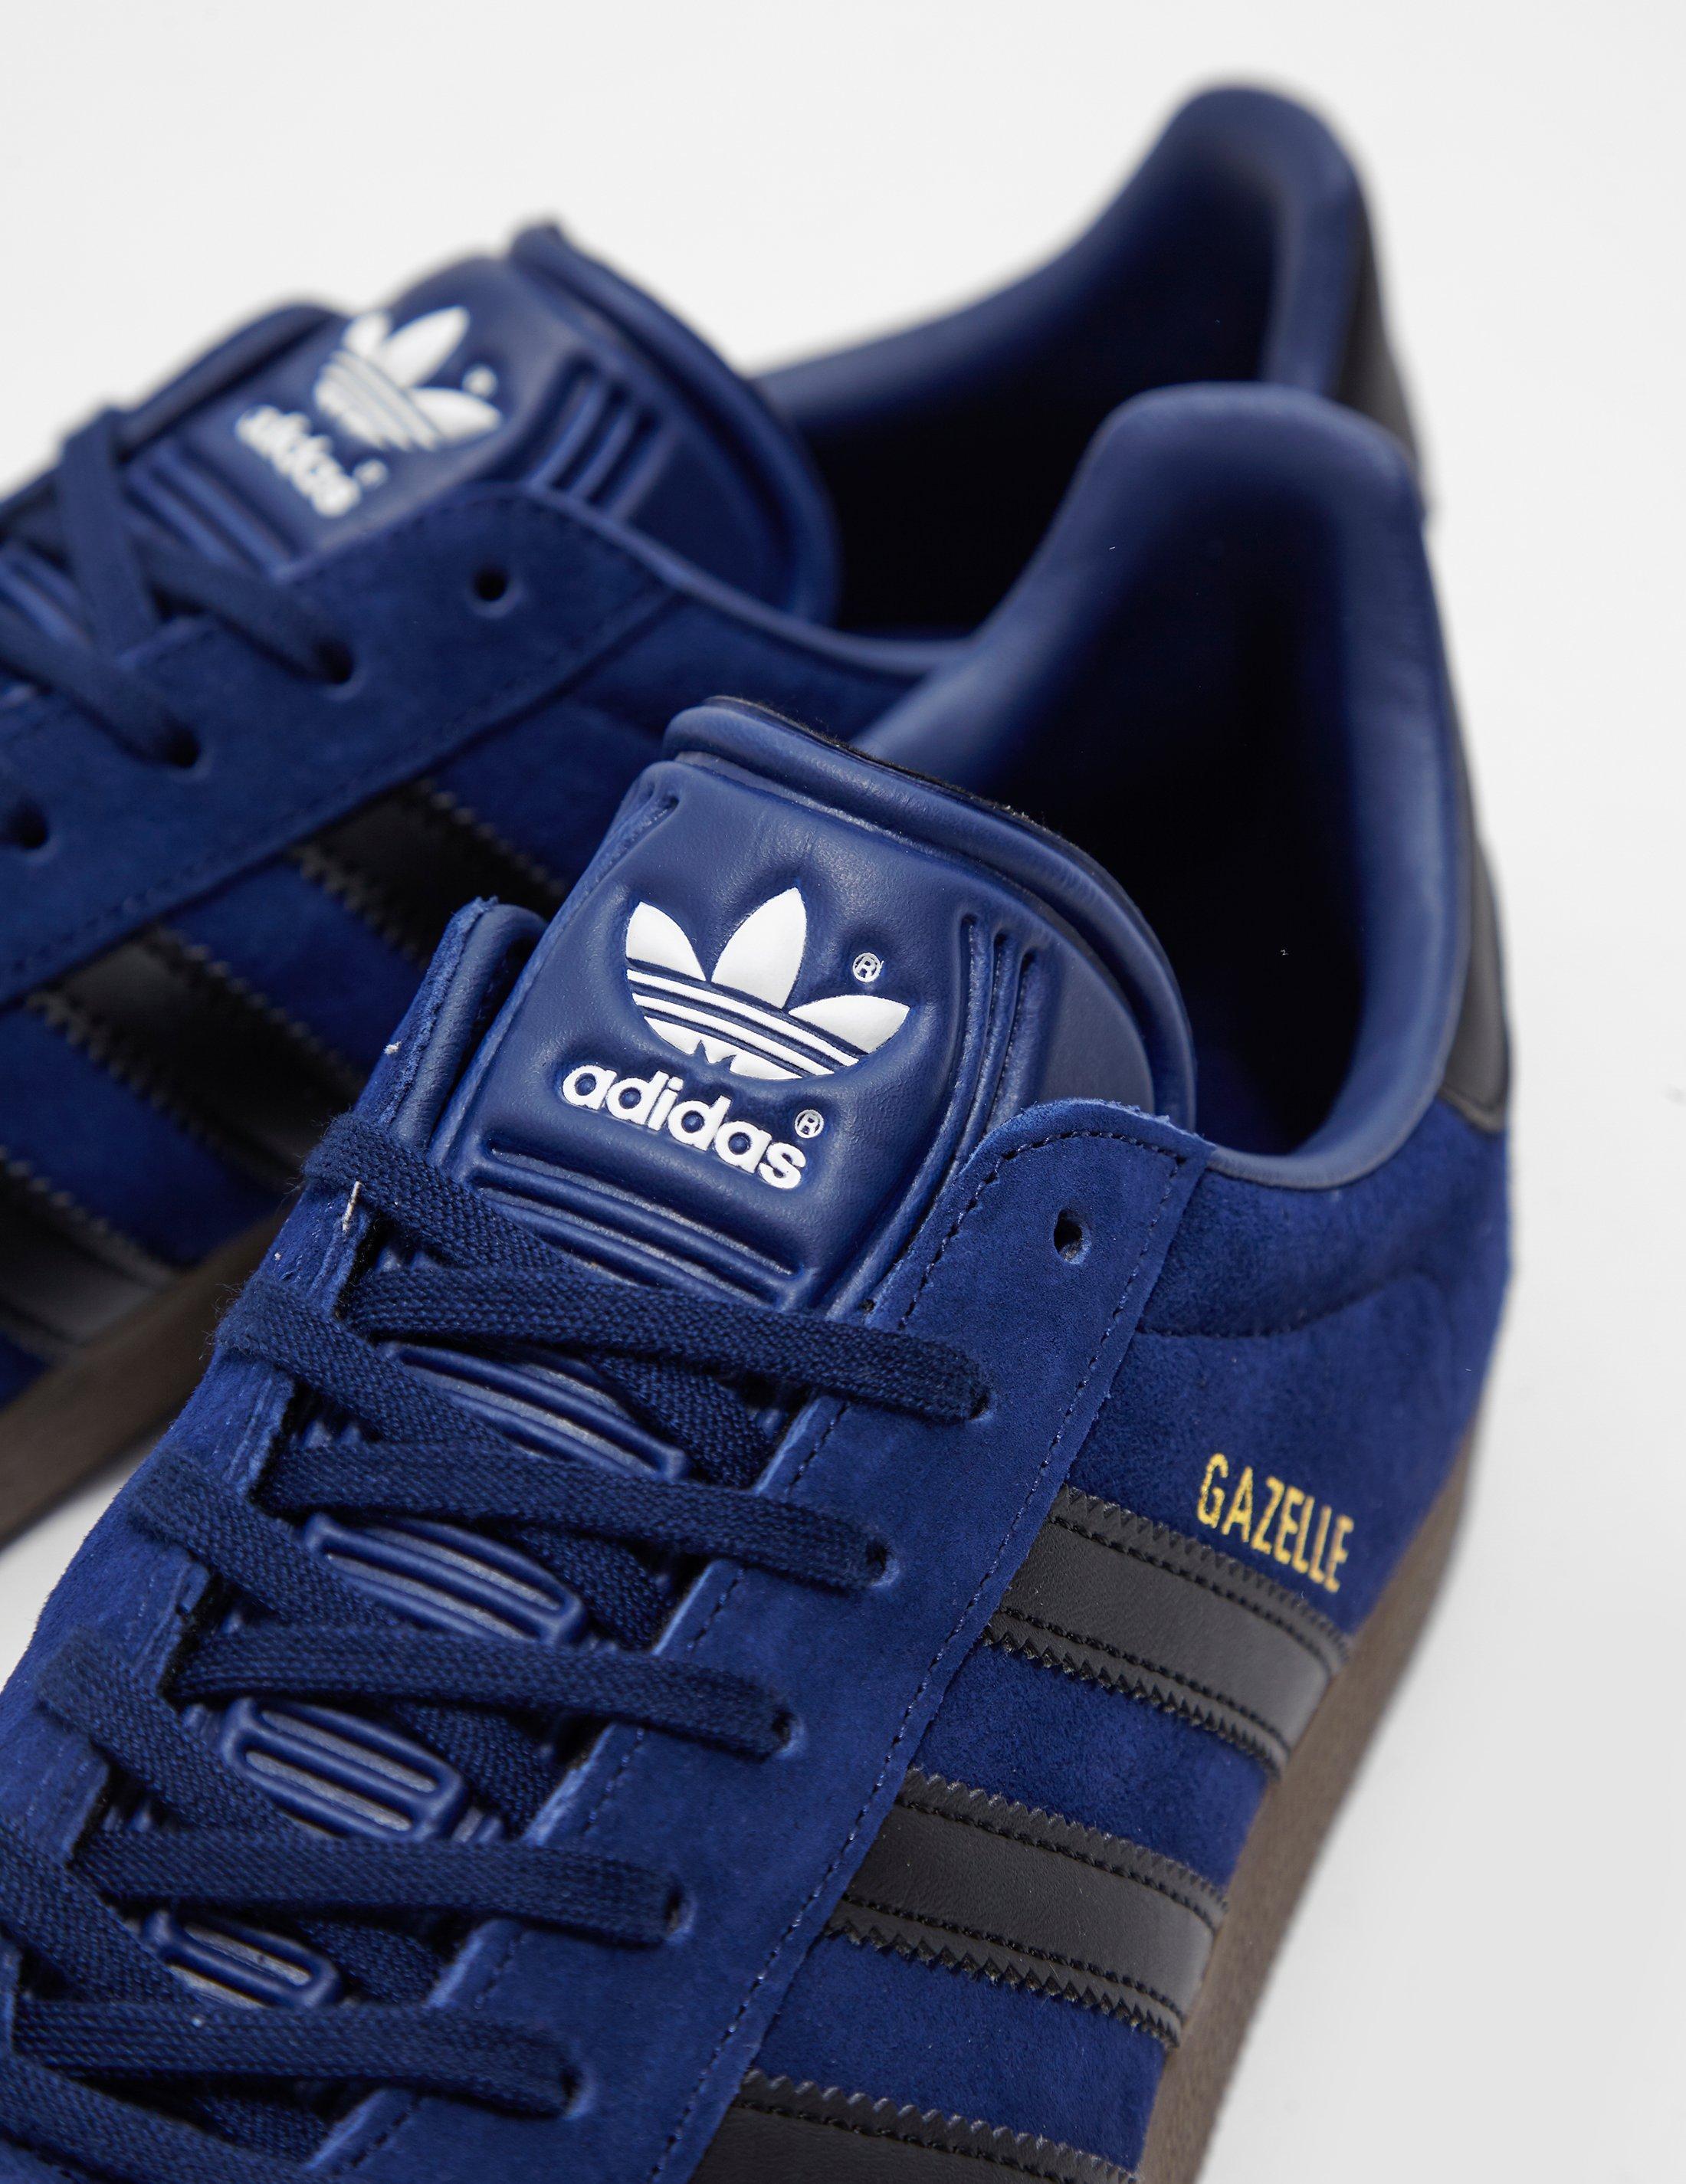 quality design d98b0 989cd Lyst - adidas Originals Mens Gazelle Blue in Blue for Men